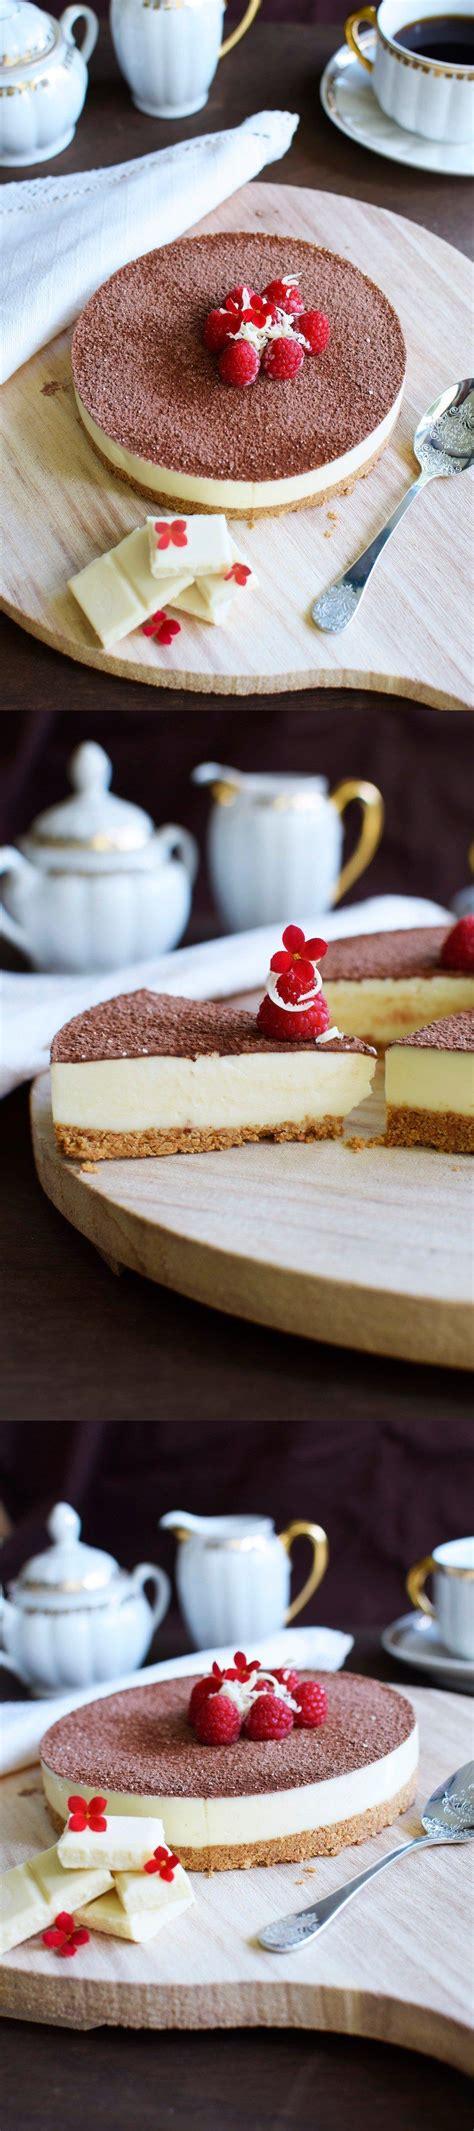 Deliciosa cheesecake de chocolate blanco | Comida ...